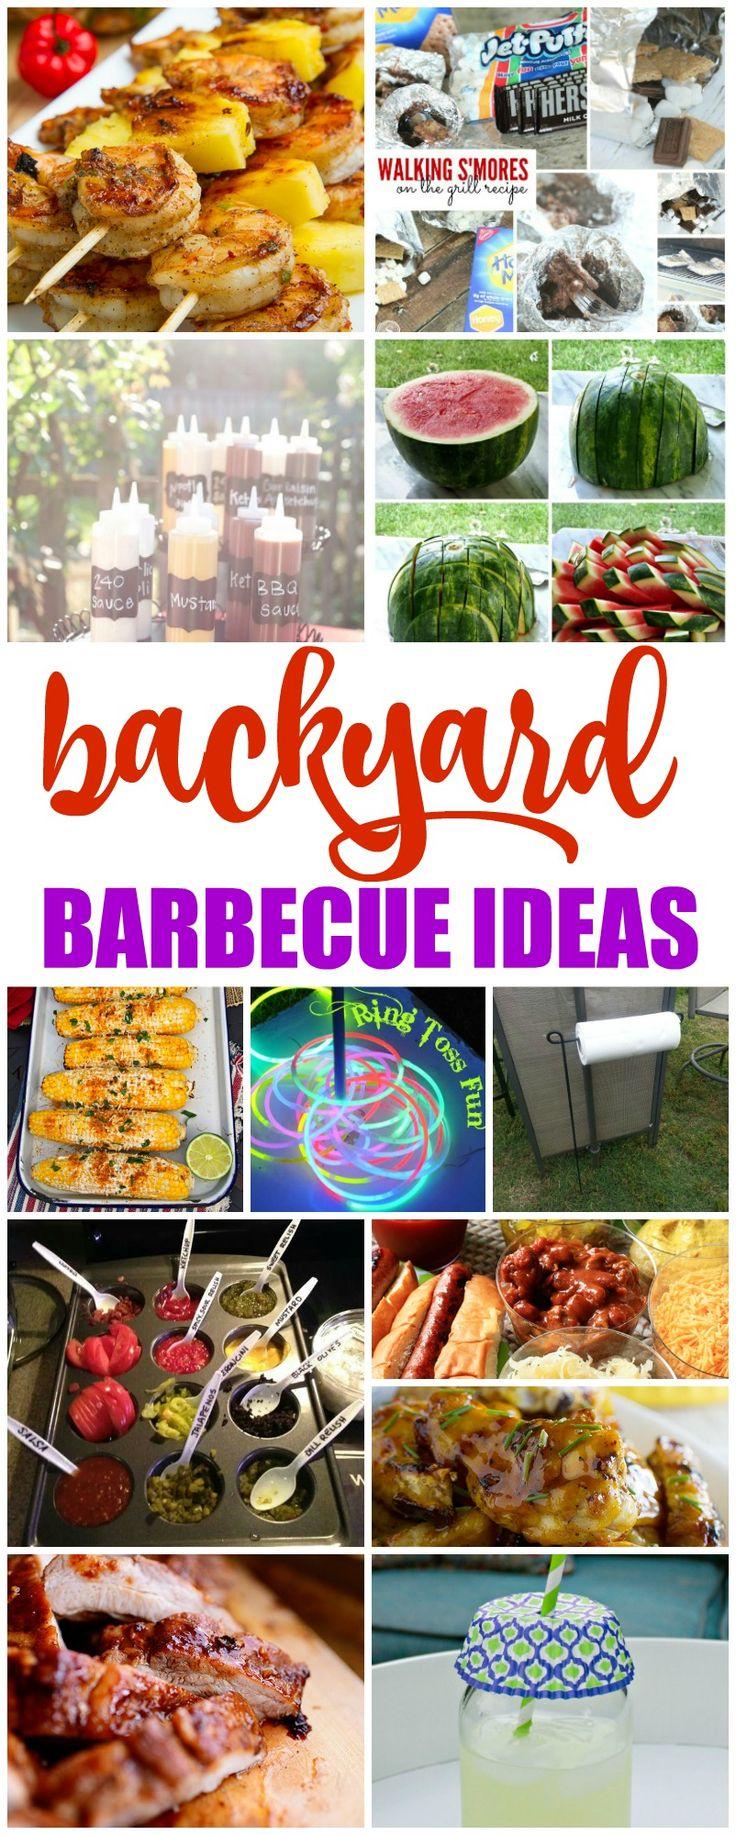 backyard barbecue ideas recipes for summer barbecue recipes barbecue